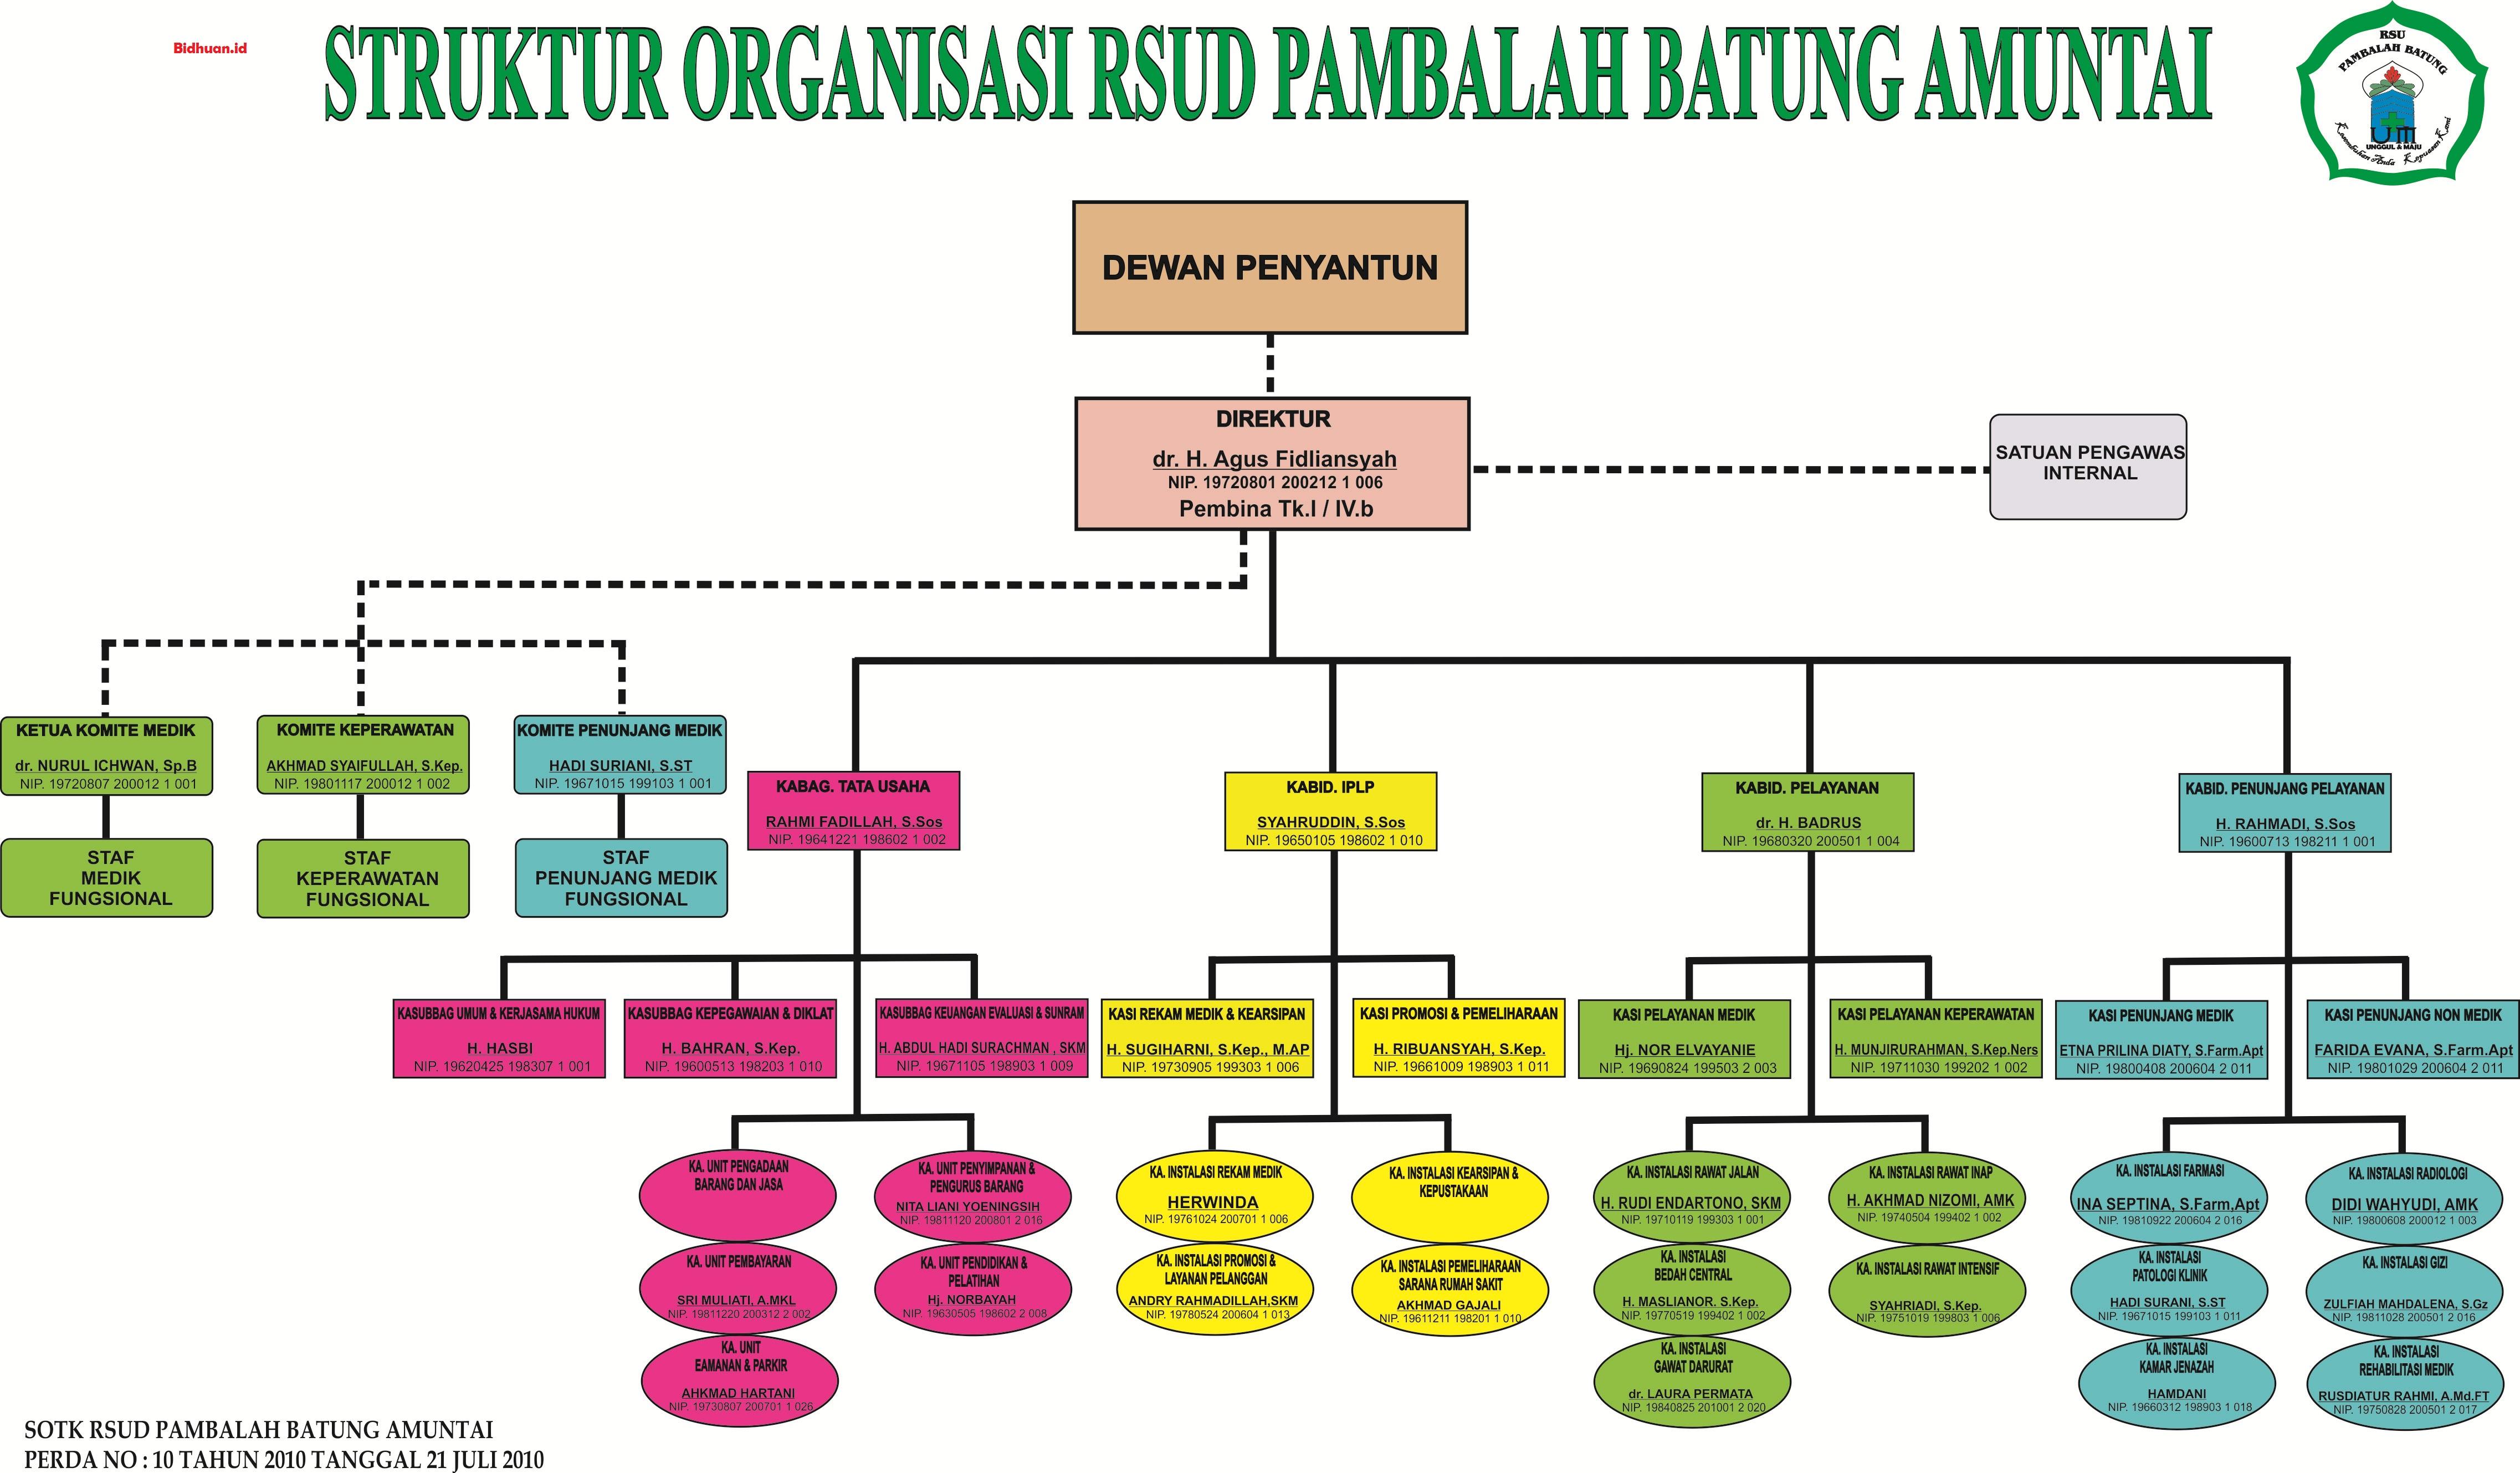 Struktur organisasi rumah sakit: Direktur